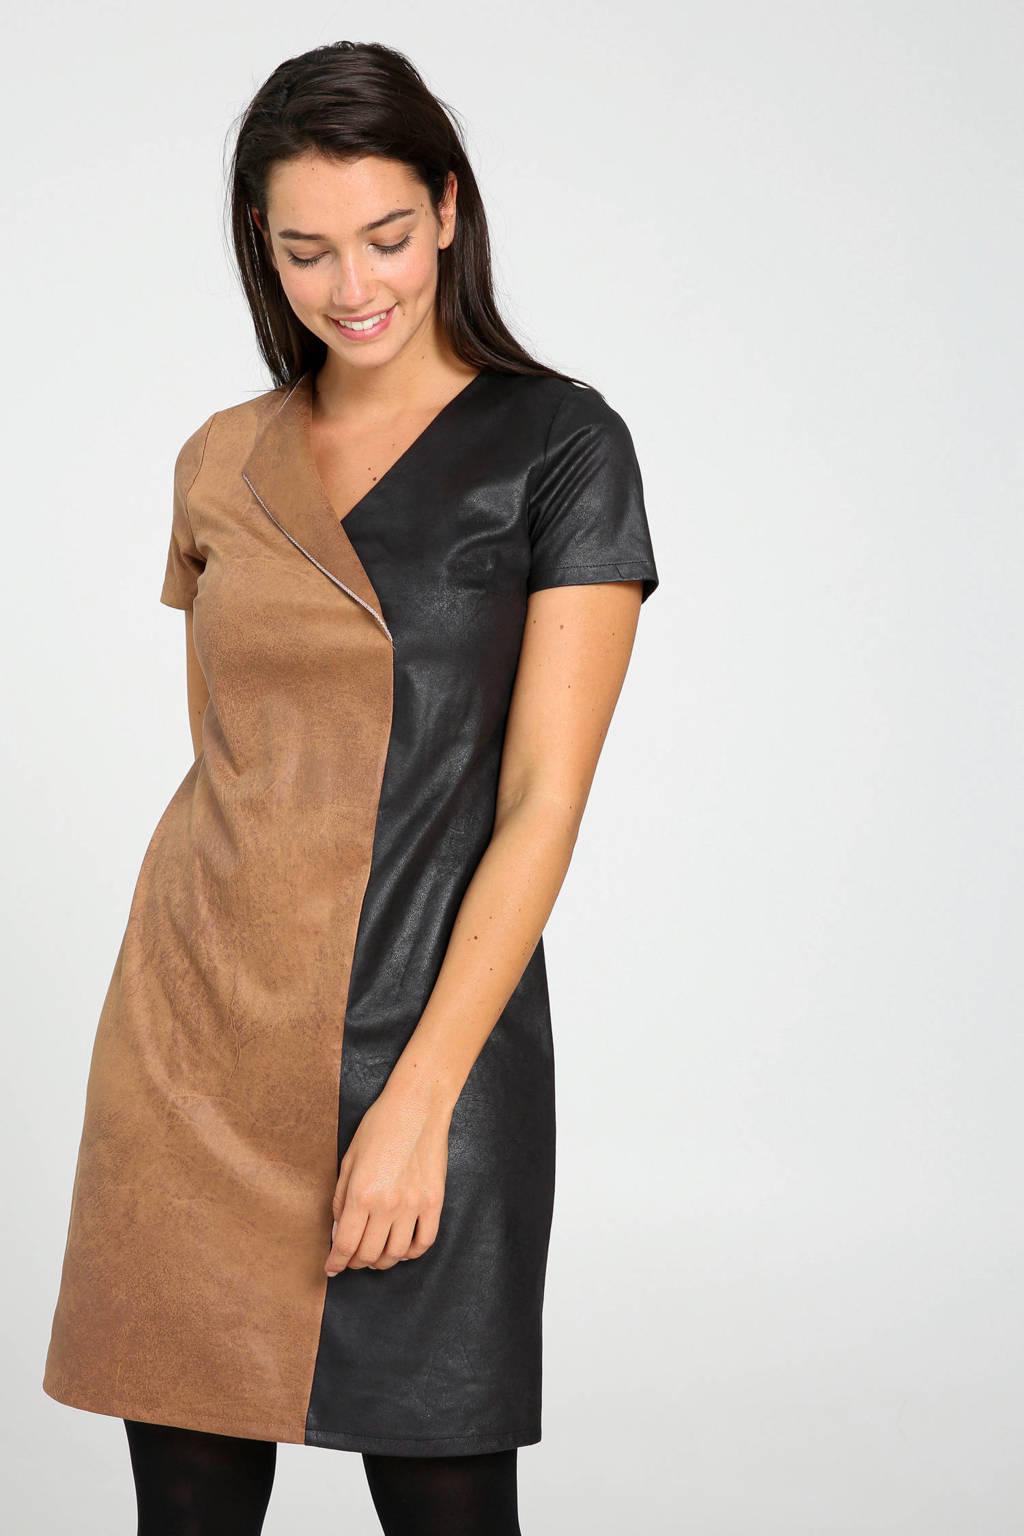 Cassis coated jurk zwart/bruin met omslagdetail, Zwart/bruin